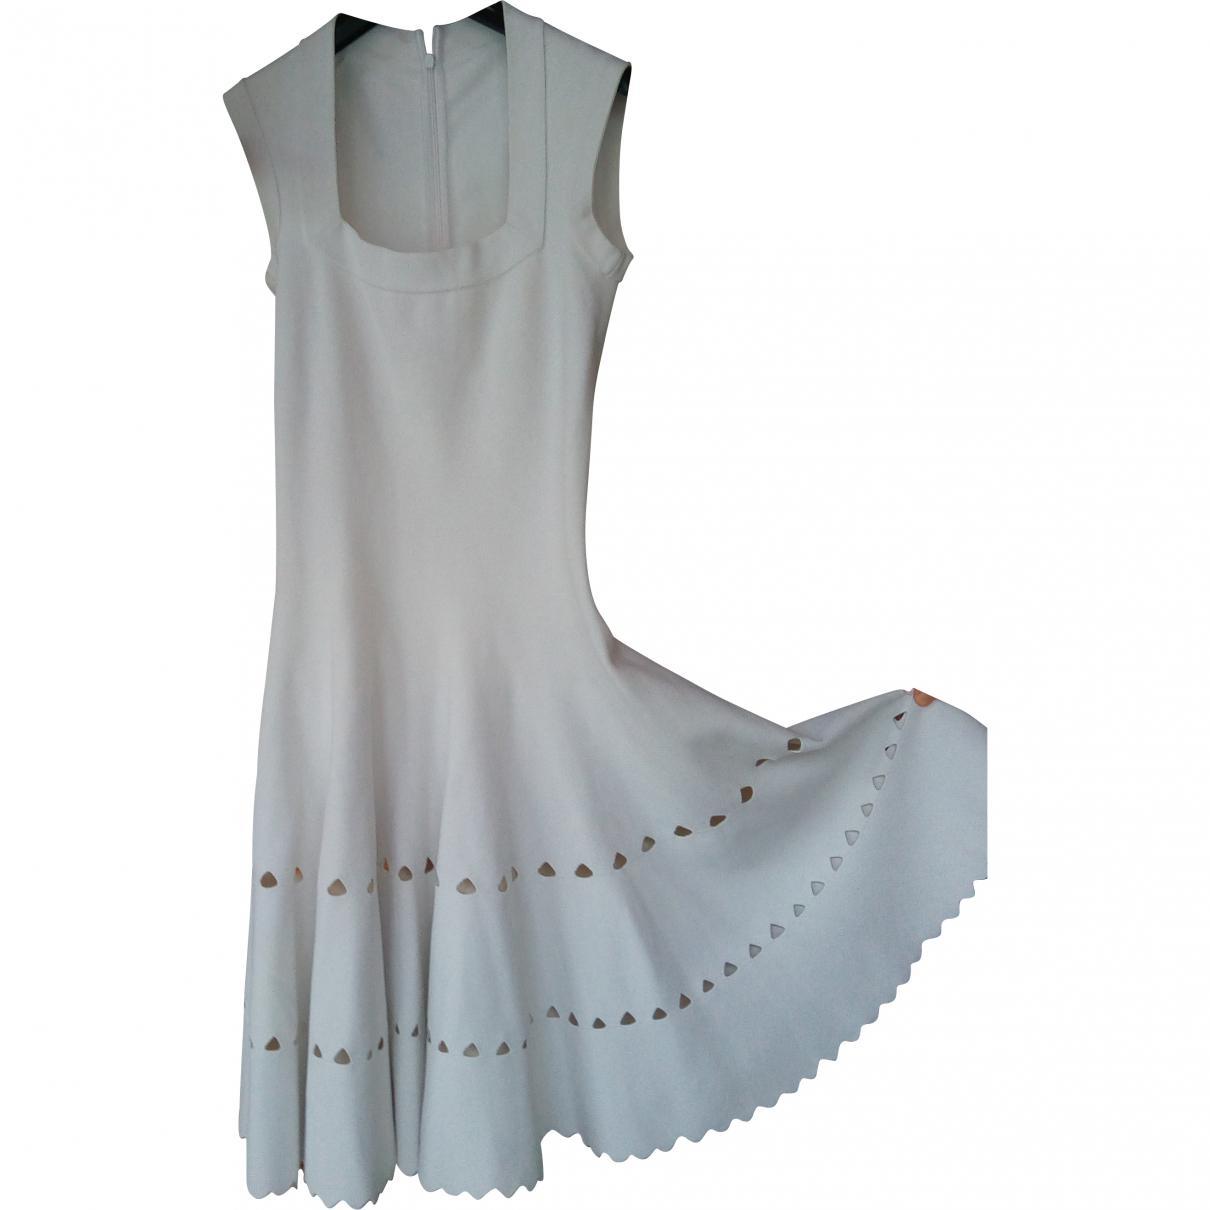 a10beeeca12 Alaïa Mid-length Dress in White - Lyst